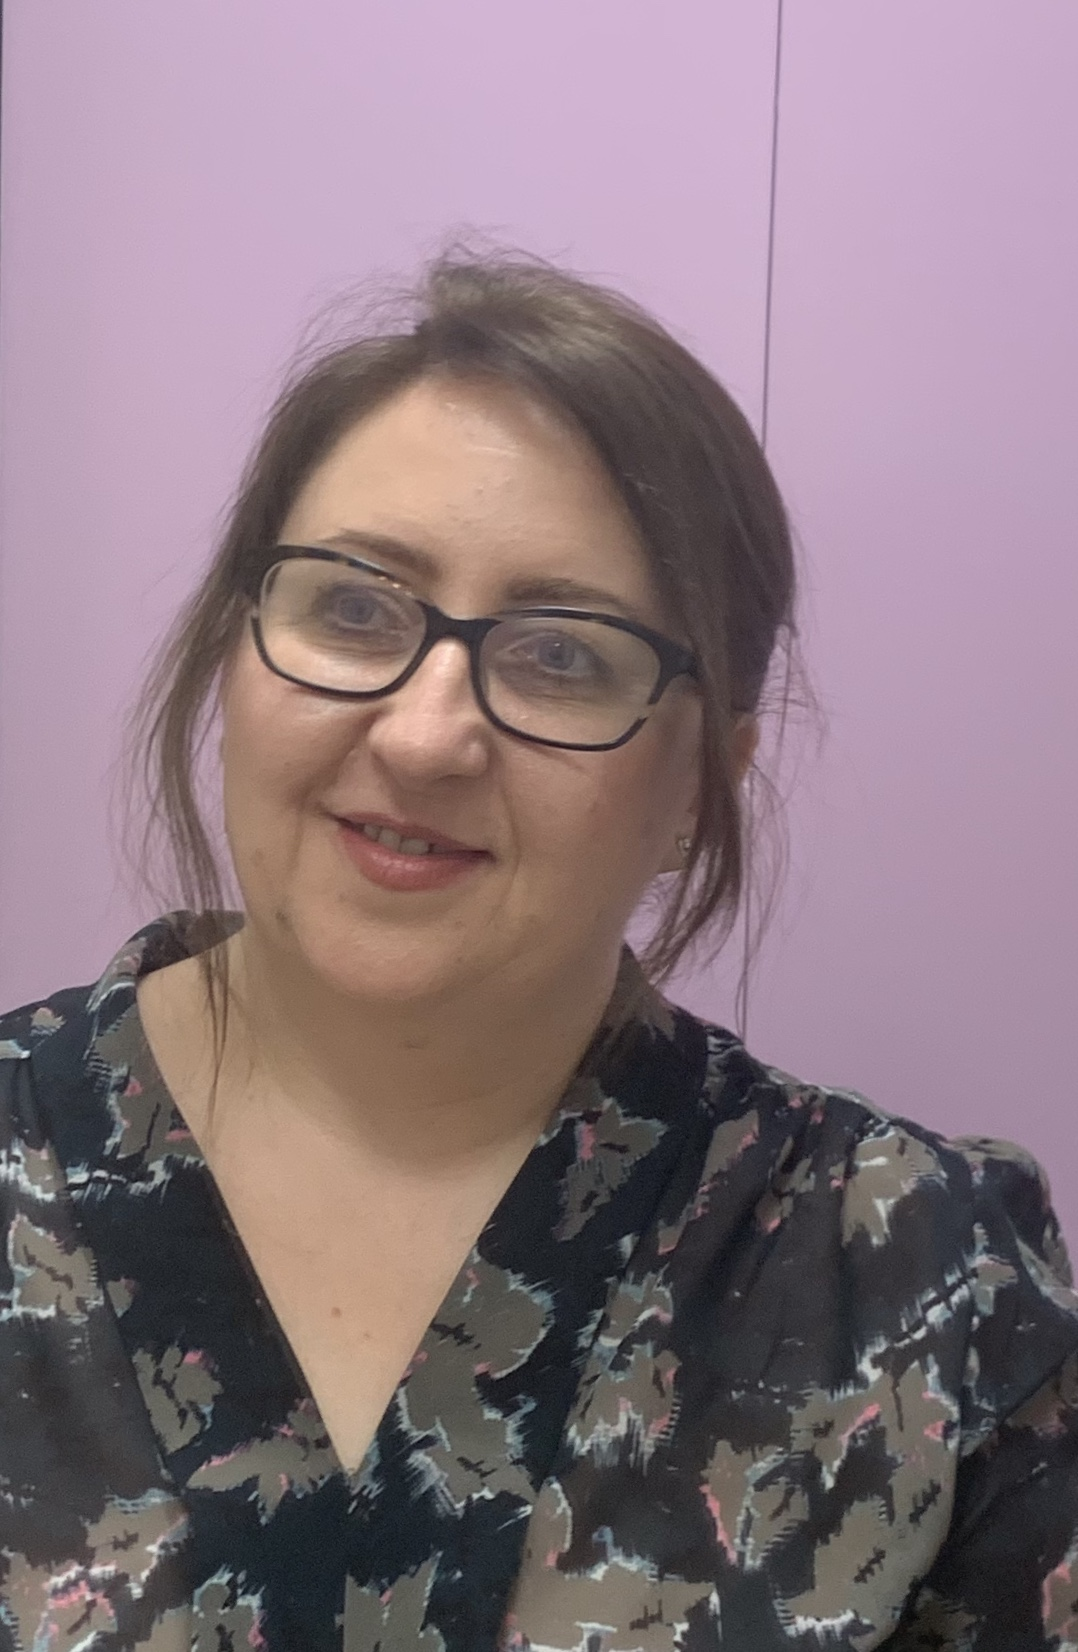 Zuzanna Horowska